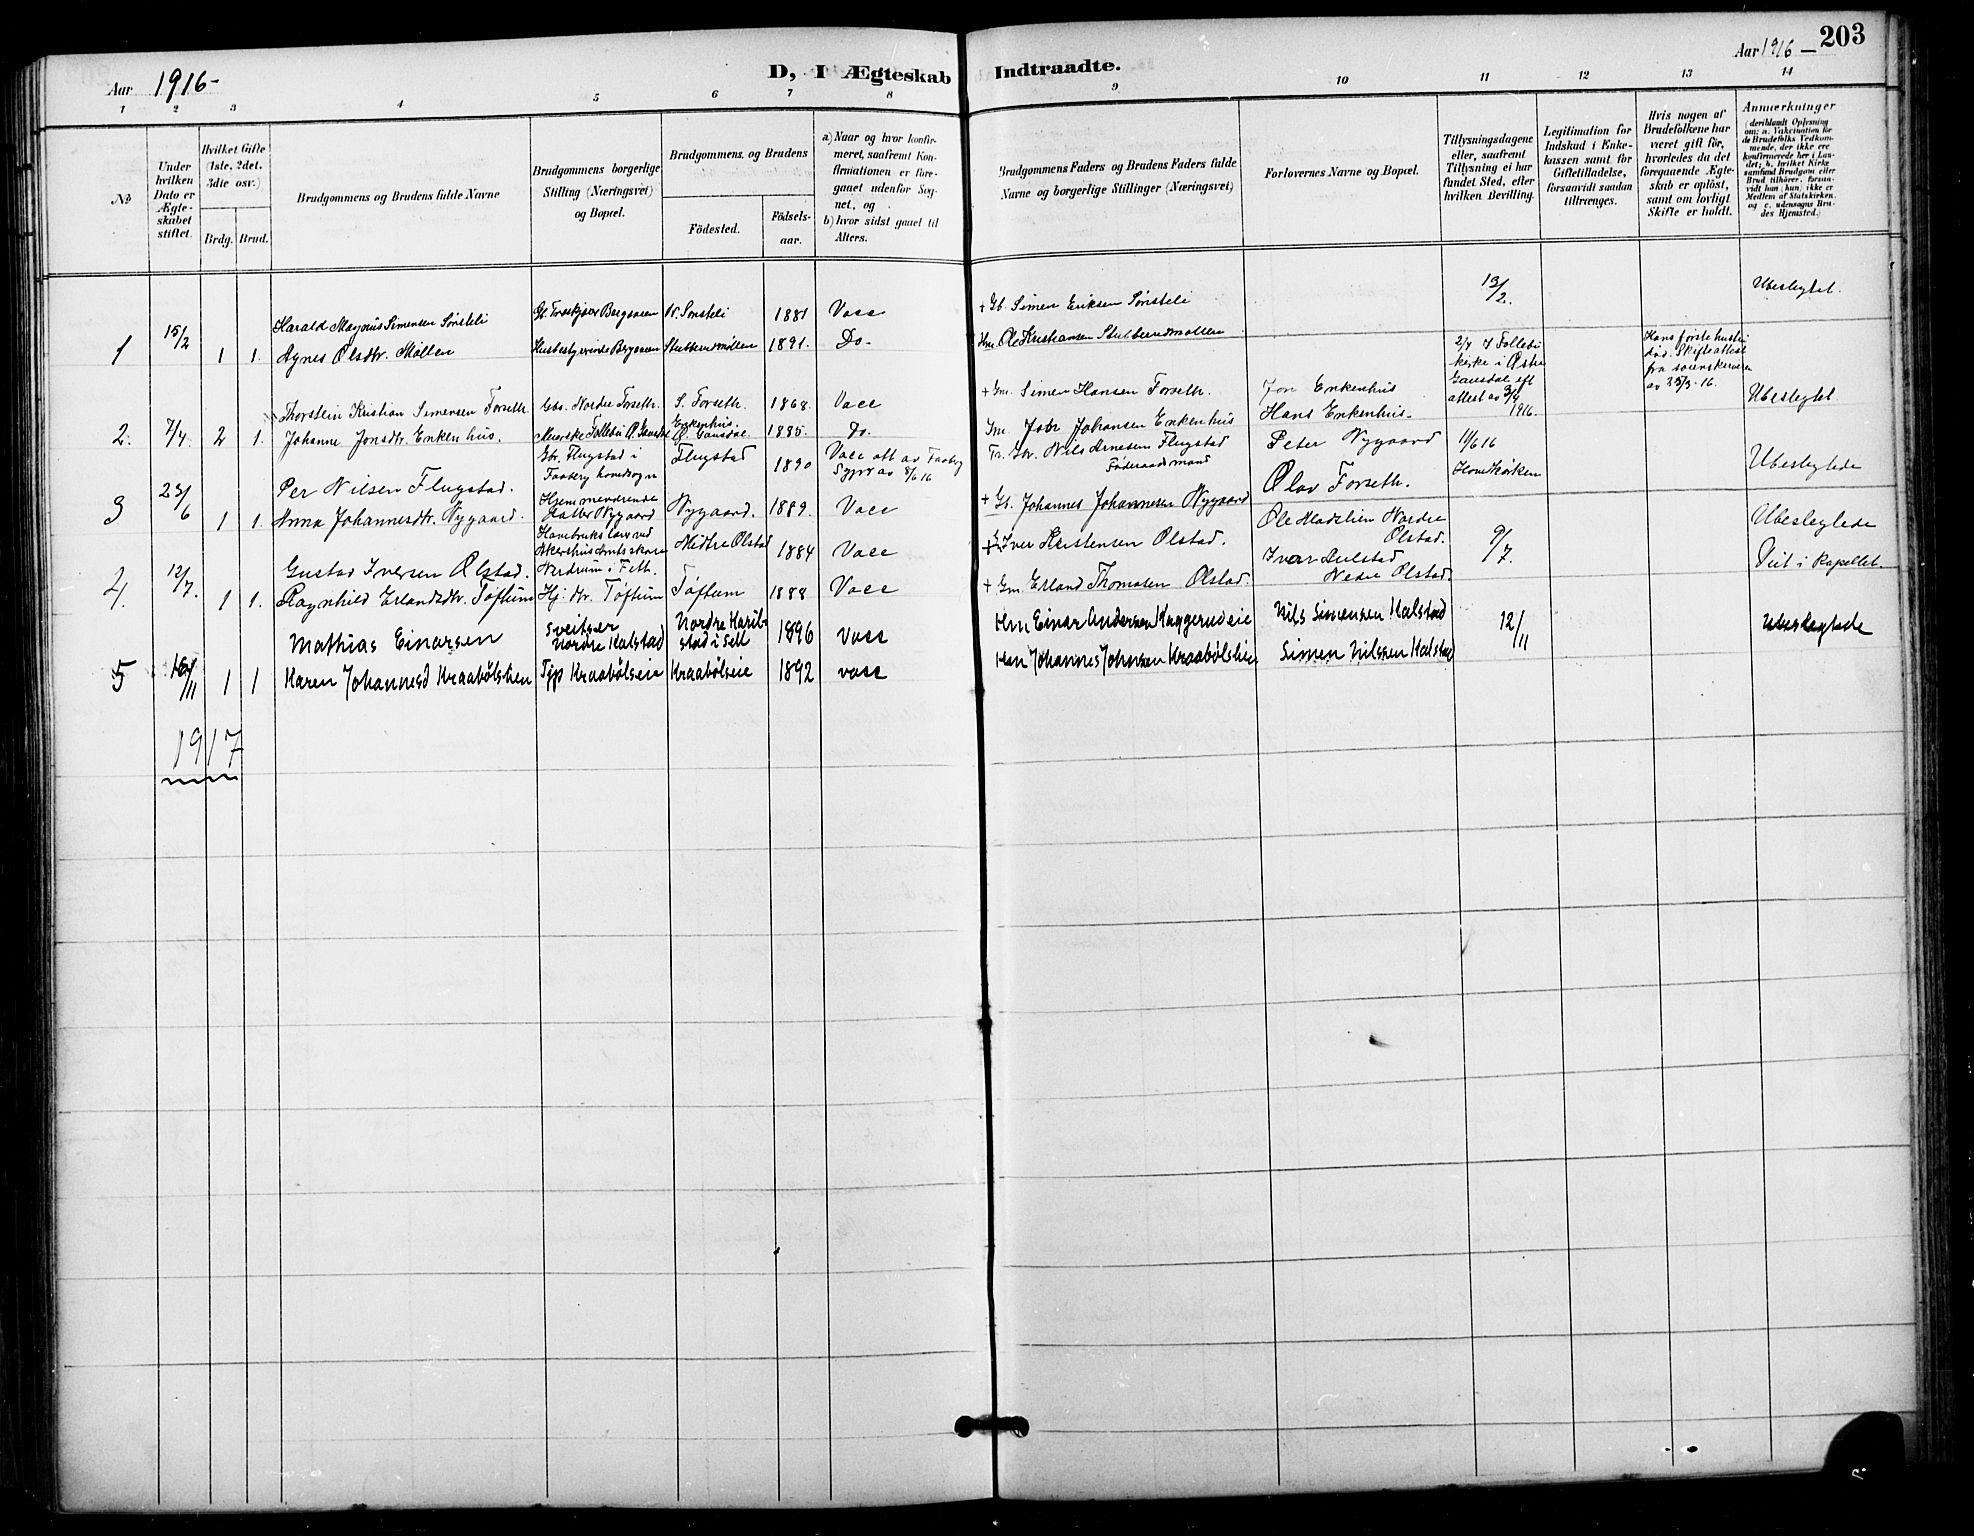 SAH, Vestre Gausdal prestekontor, Klokkerbok nr. 3, 1896-1925, s. 203